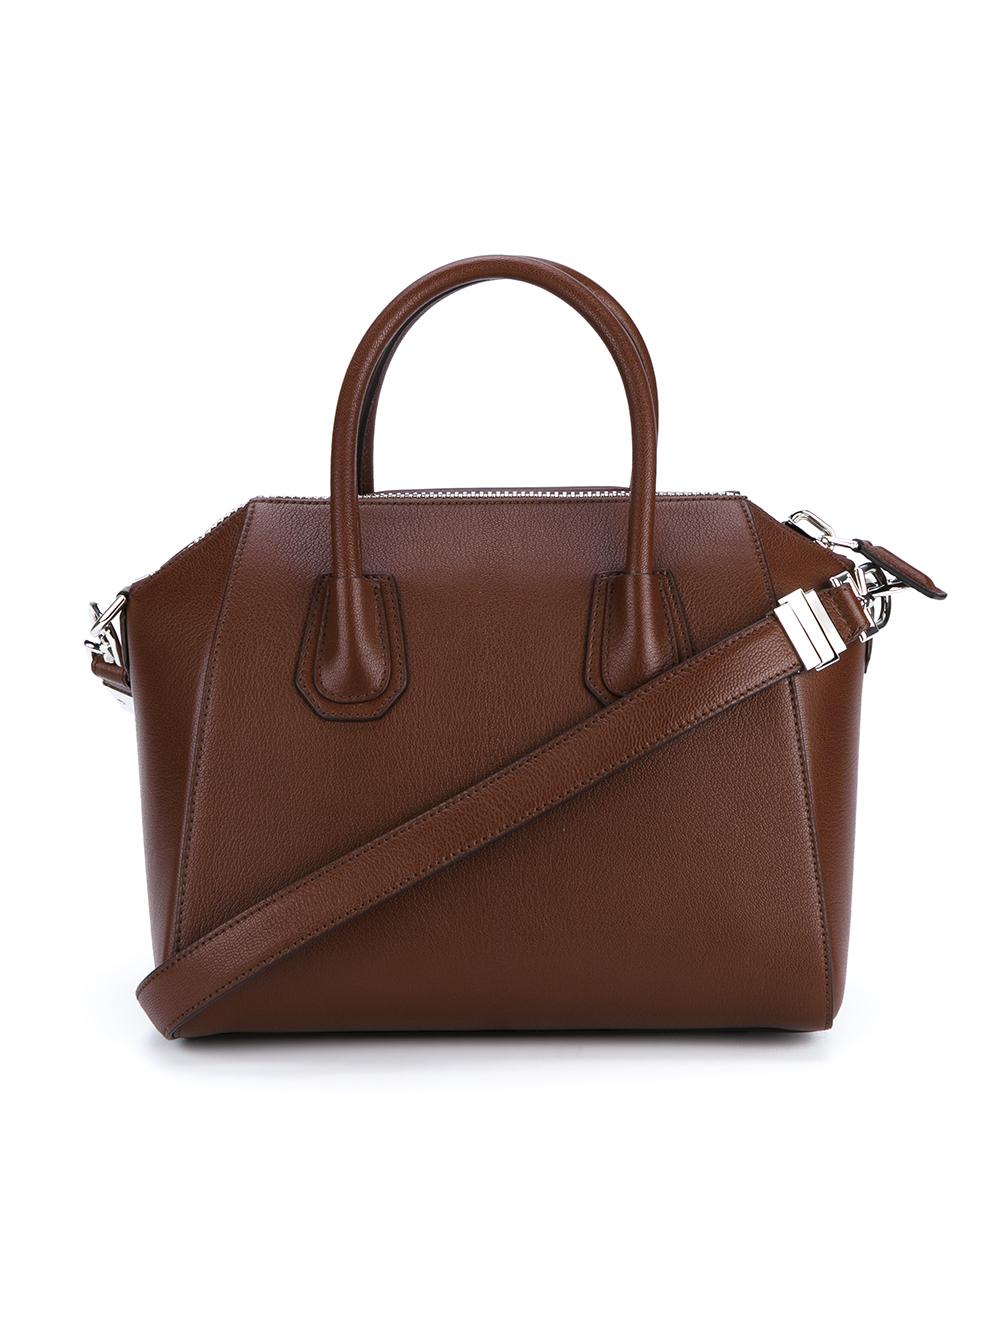 9efa9837e311 Lyst - Givenchy Small Antigona Leather Bag in Brown